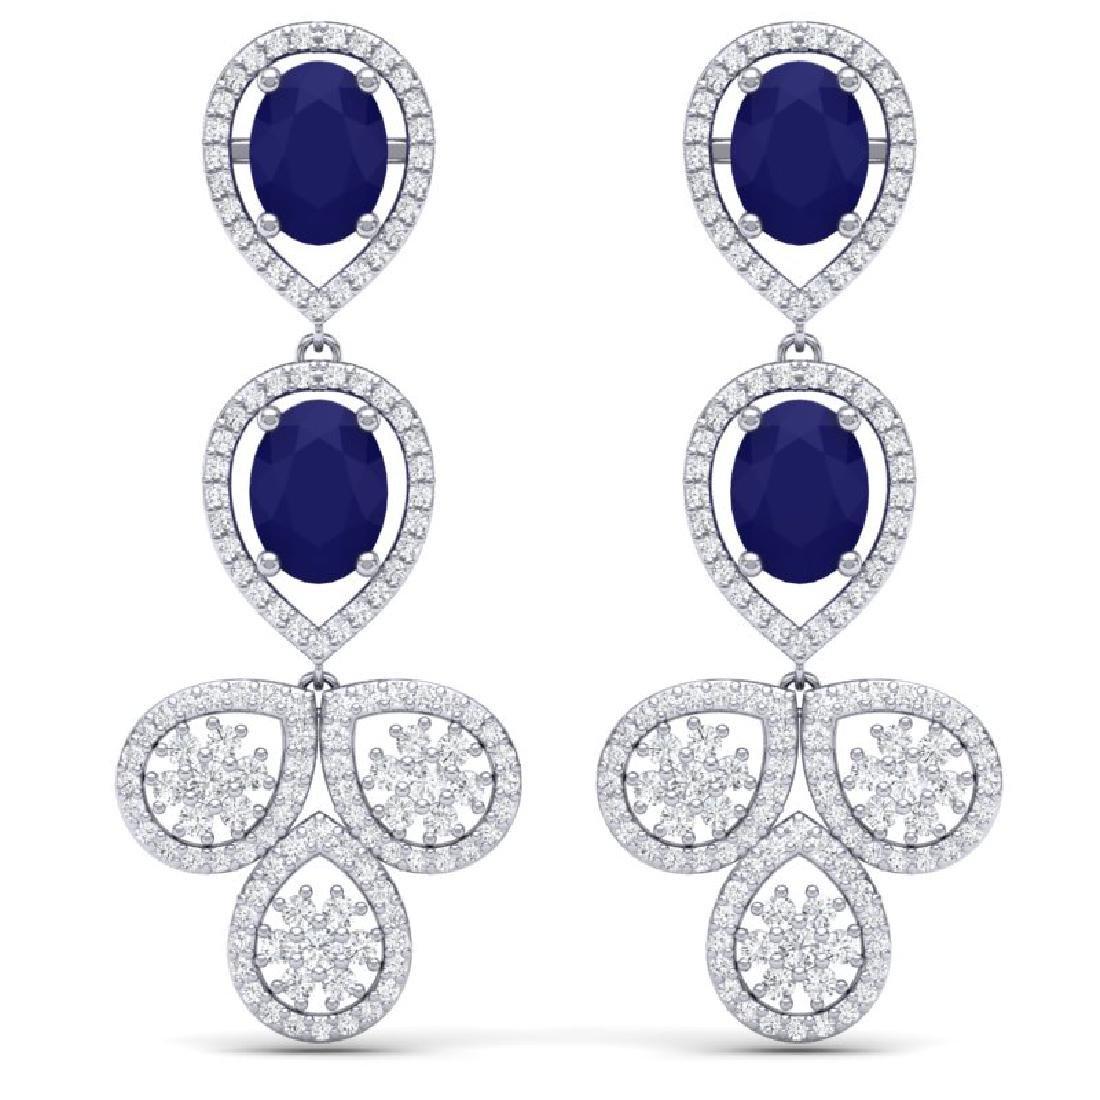 9.75 CTW Royalty Sapphire & VS Diamond Earrings 18K